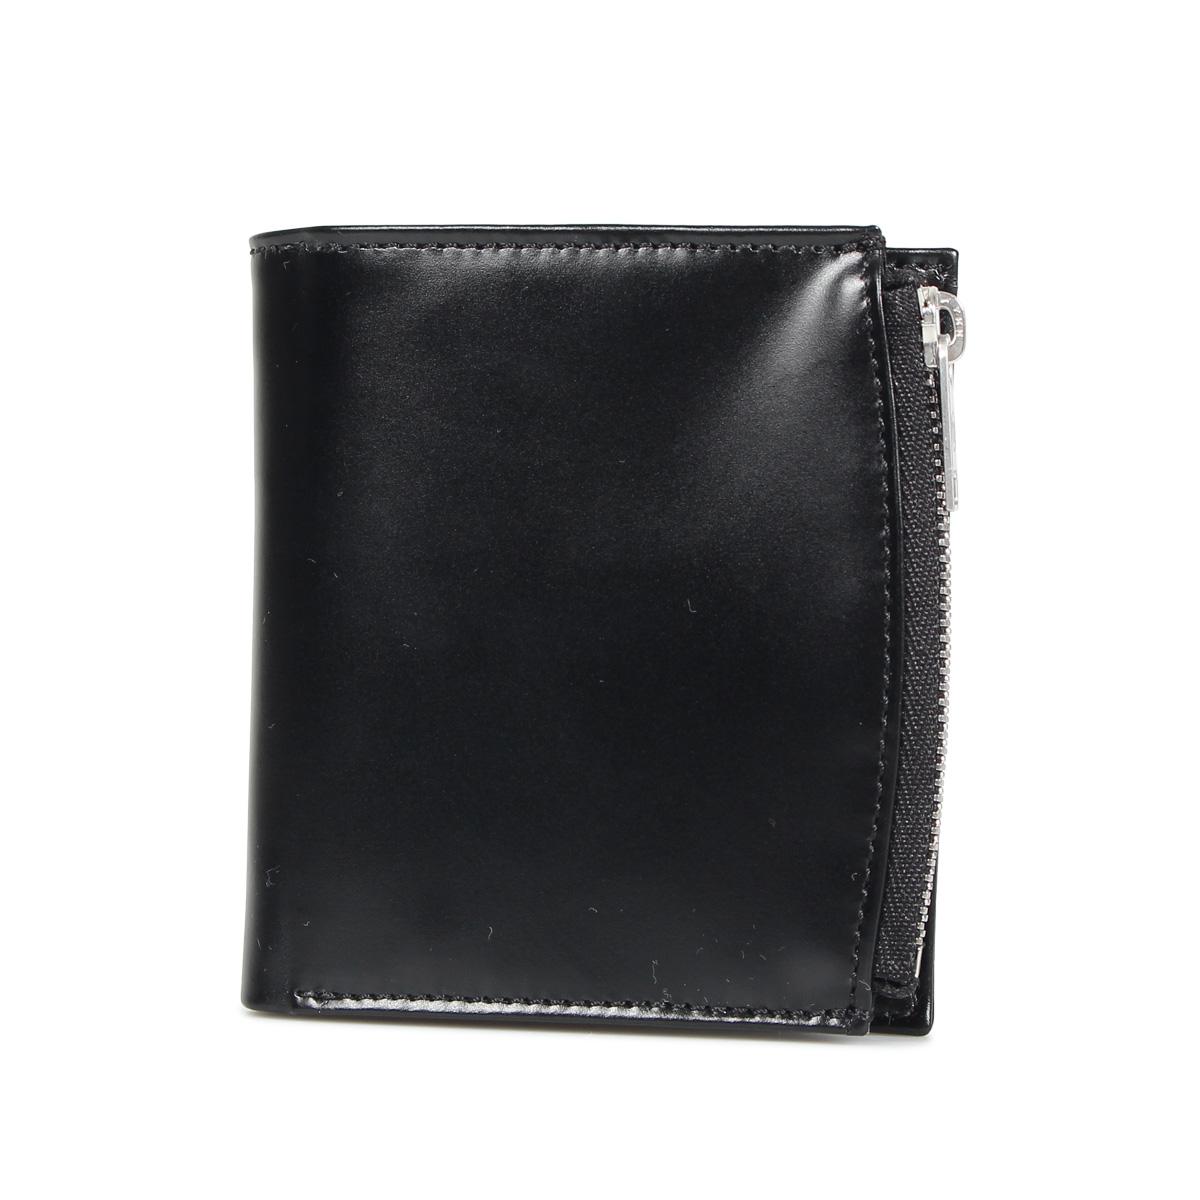 MAISON MARGIELA BI-FOLD WALLET メゾンマルジェラ 財布 二つ折り メンズ レディース ブラック ネイビー ベージュ ブラウン 黒 S35UI0438